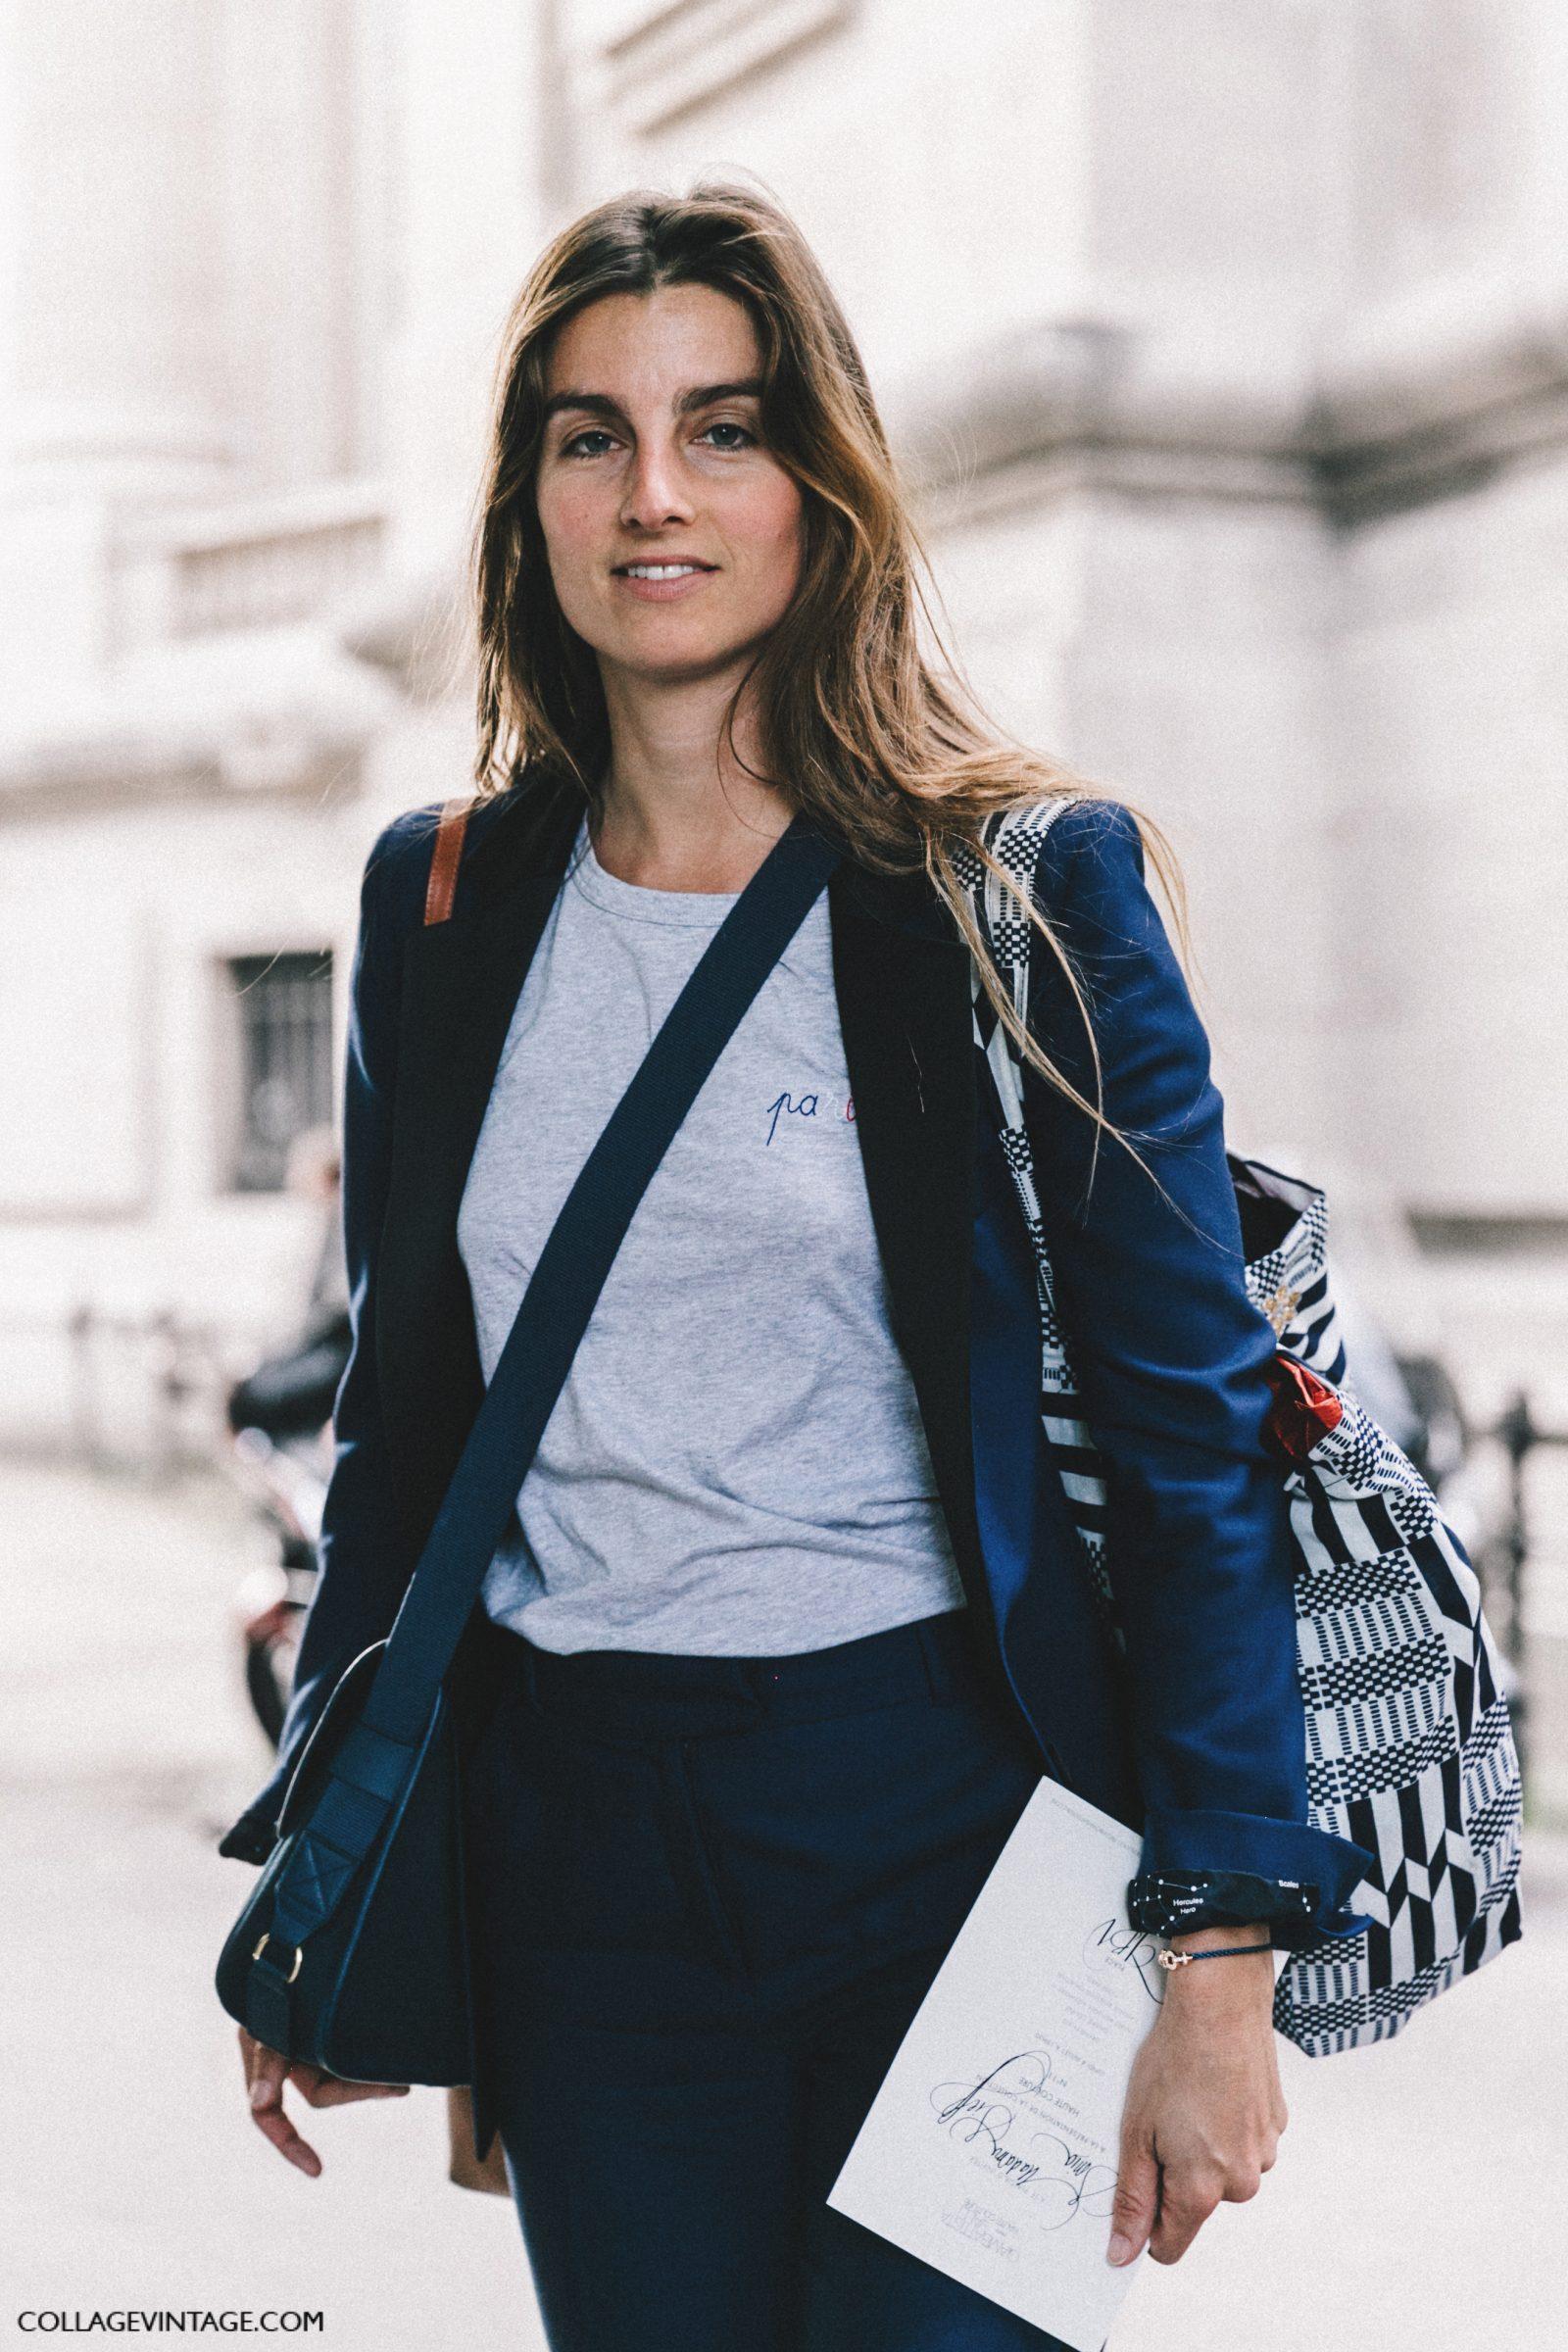 Paris_Couture_Fashion_Week-Collage_Vintage-Street_Style